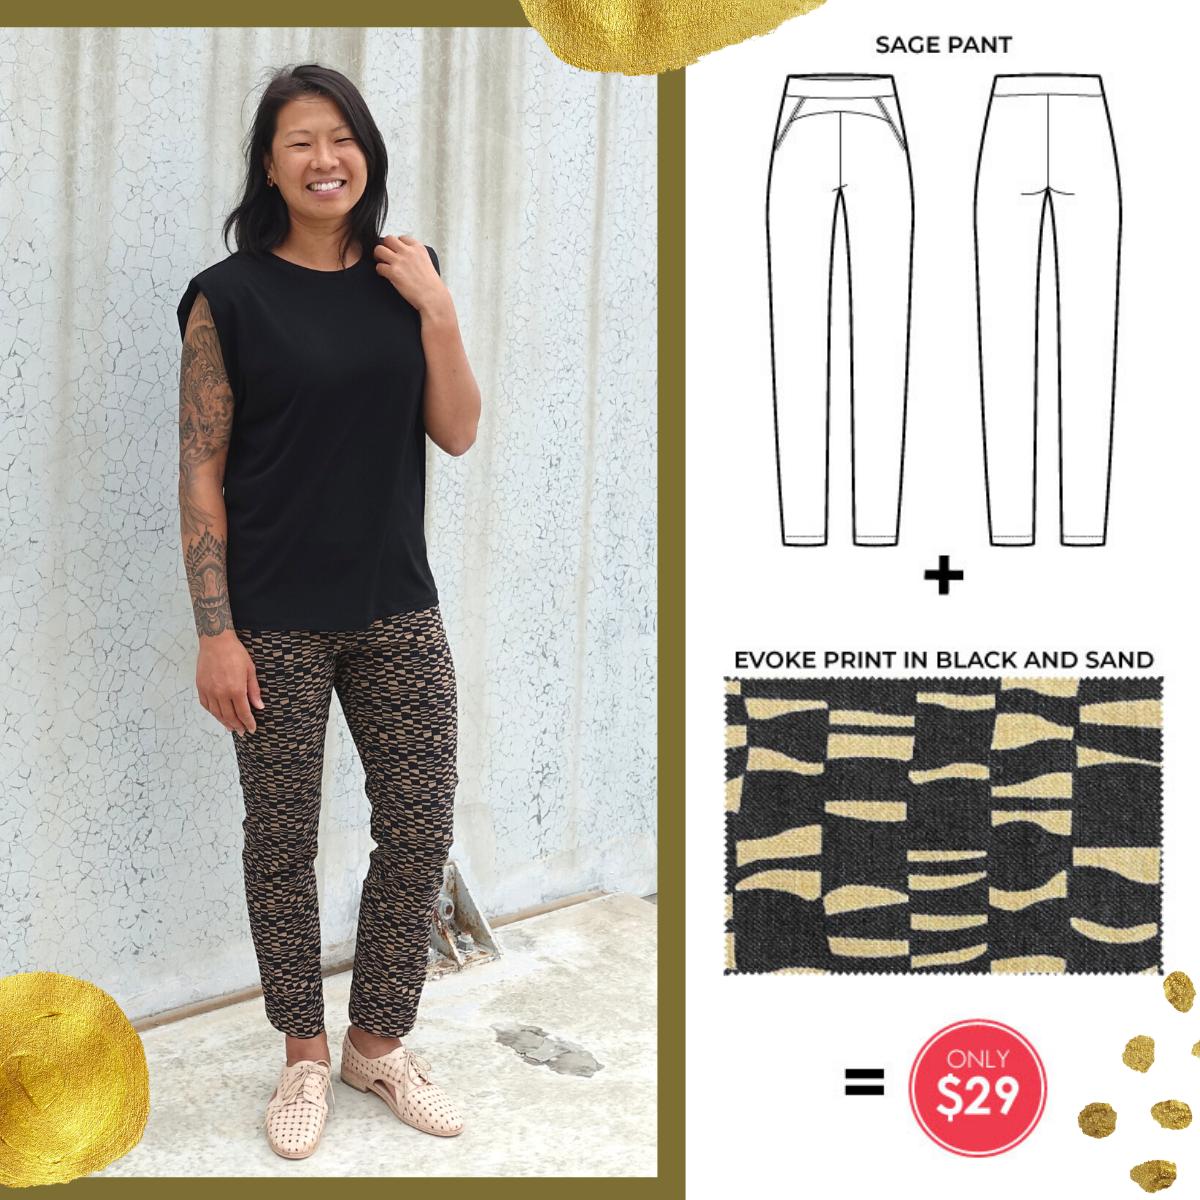 Sage Pant and Evoke Bengaline Fabric bundle- only $29